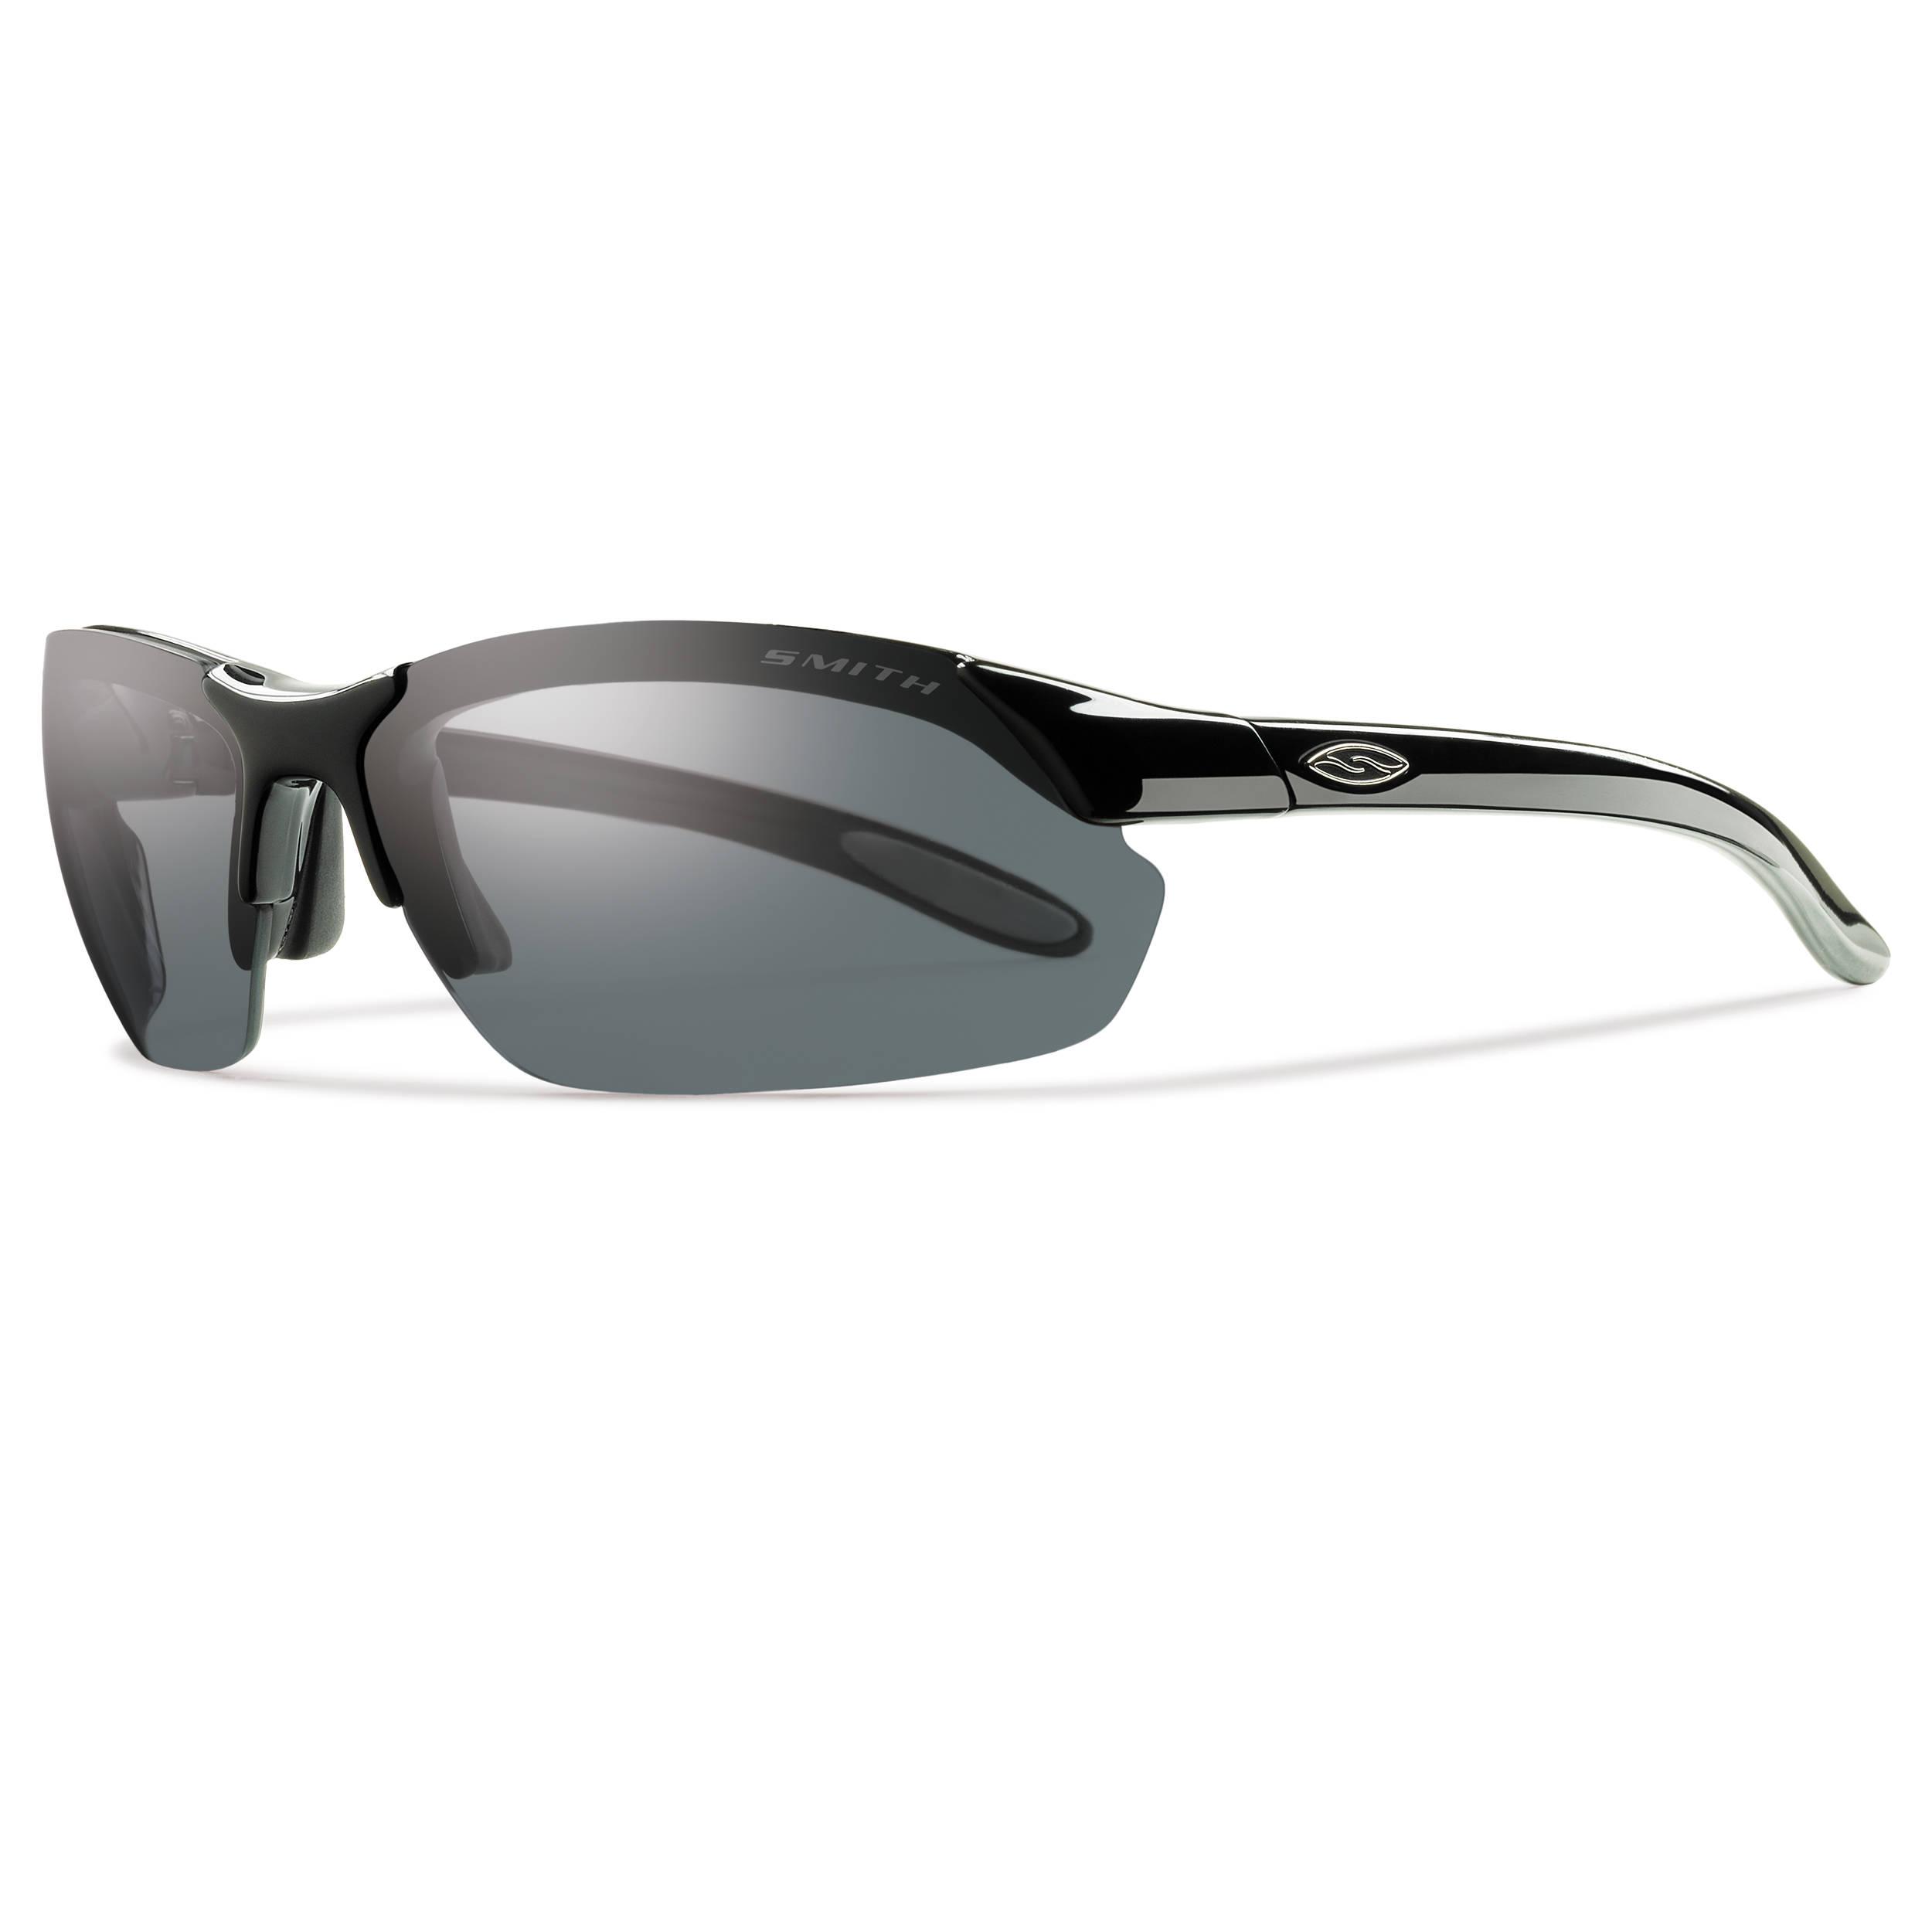 8415325f86 Smith Optics Parallel Max Sunglasses (Black - Polarized Gray Ignitor Clear)